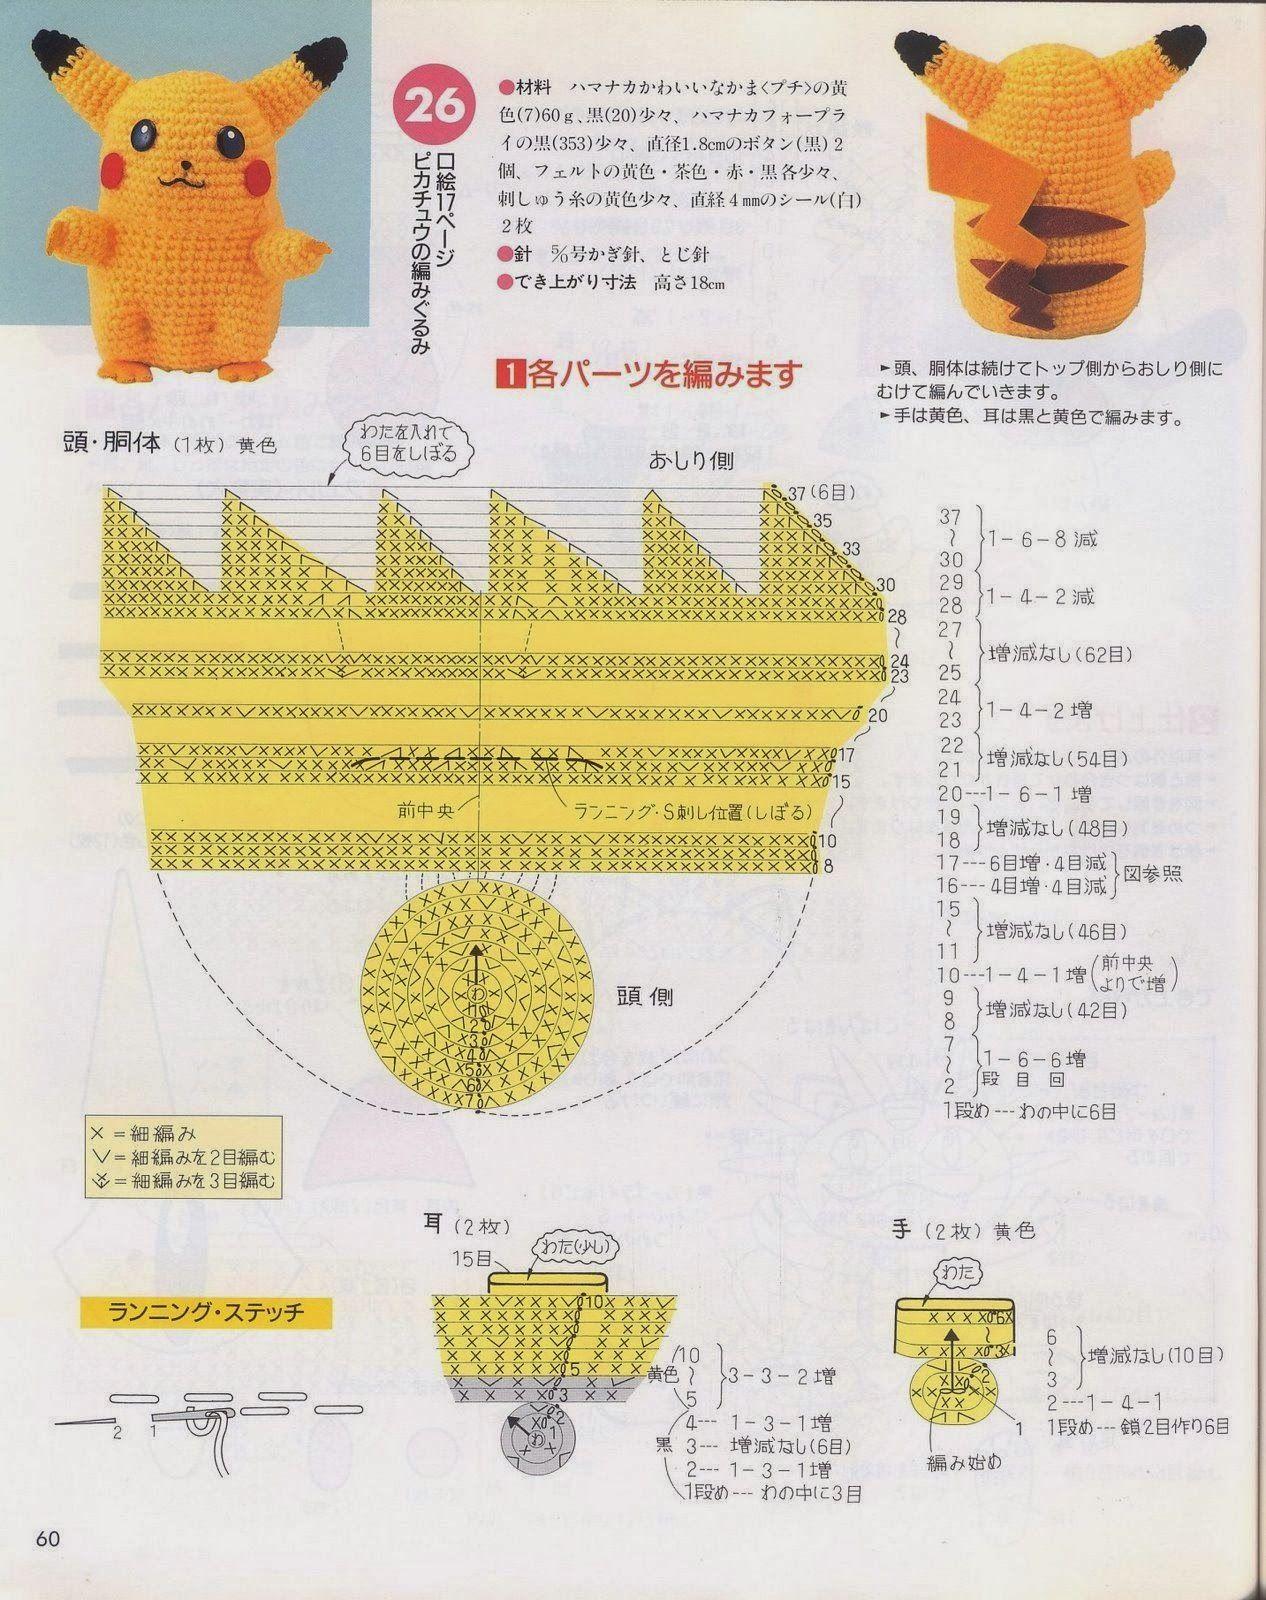 Blog de Goanna: Muñecos Pokemon en Amigurumi   Crochet Patterns ...